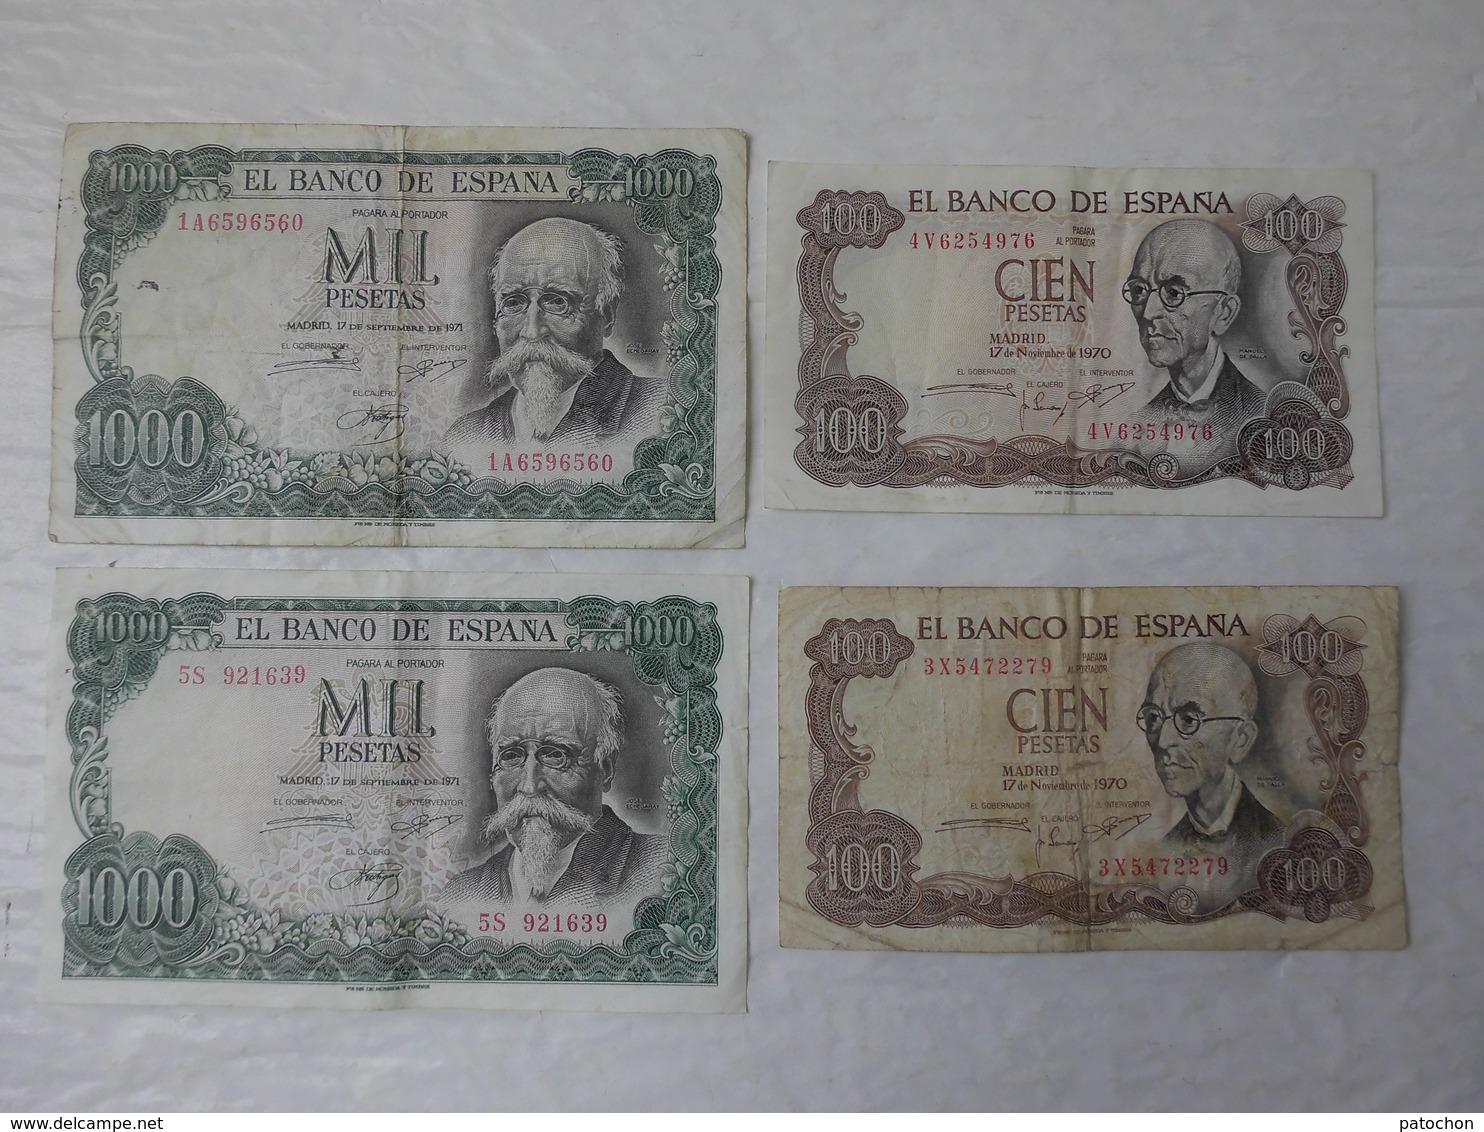 Billet De Banque Espagne 2 X 100 & 2 X 1000 Pesetas 1970 & 1971...! - 1000 Pesetas